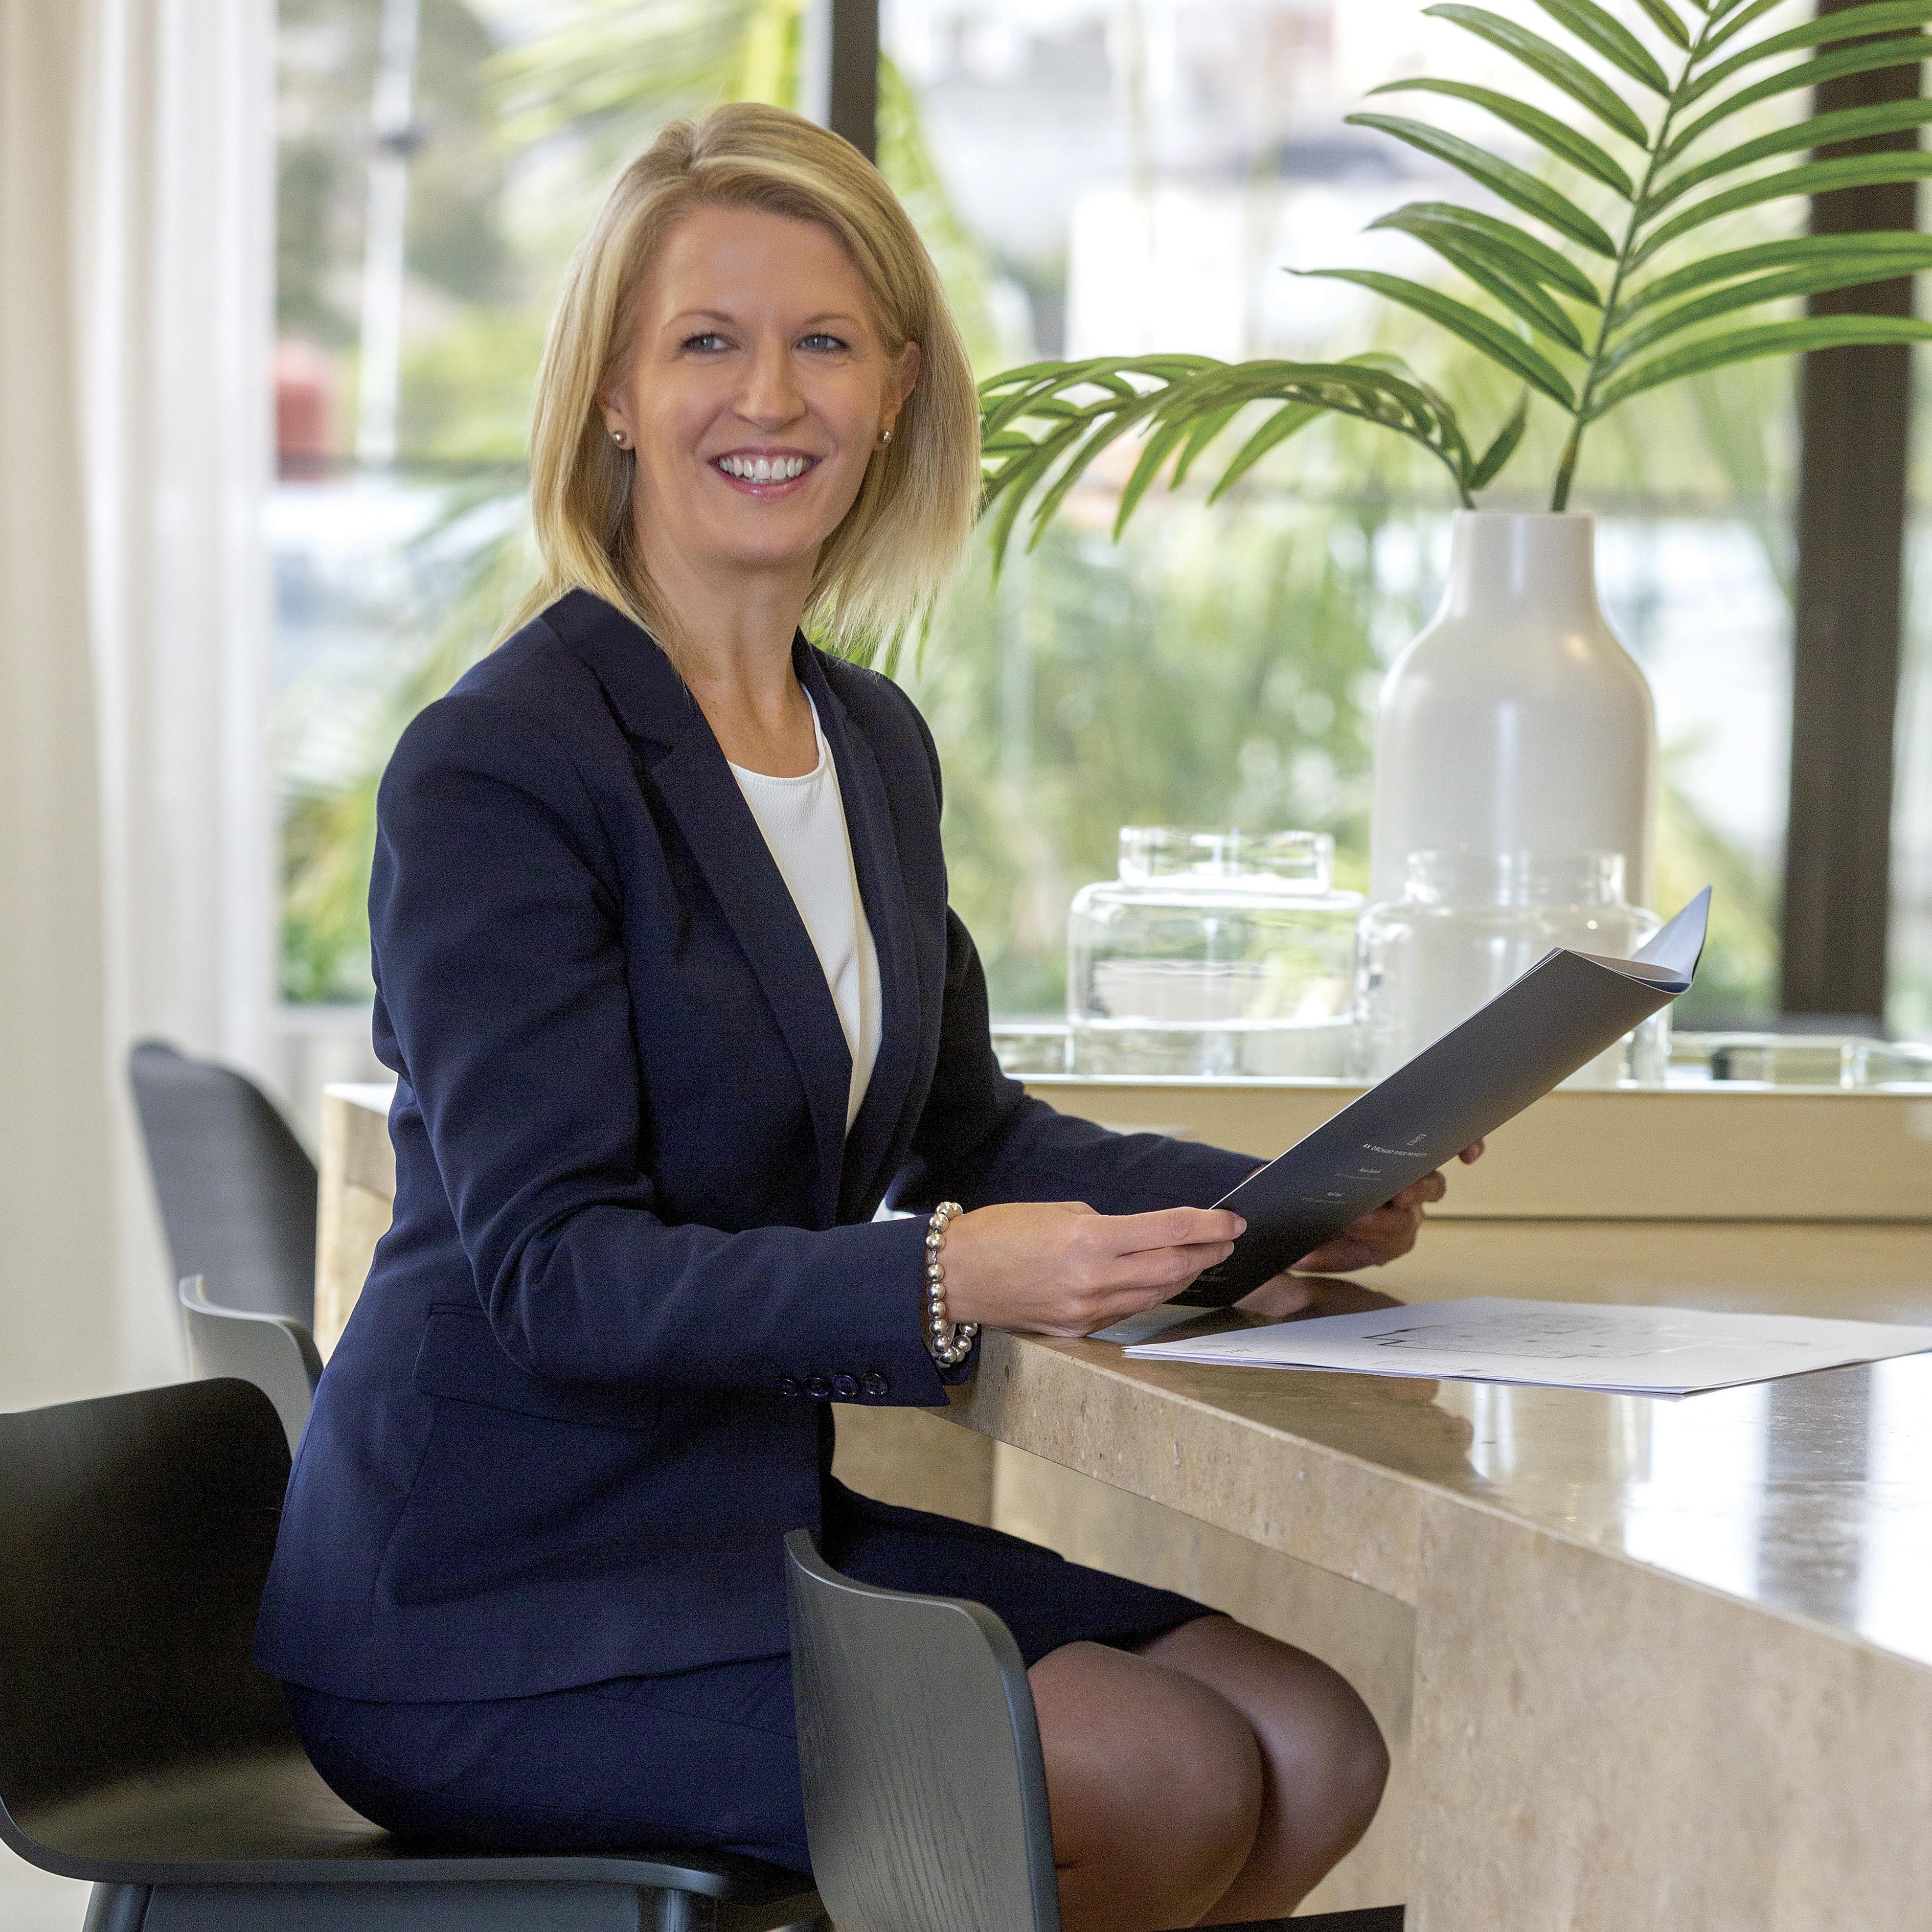 Nicole French - Professional Portrait